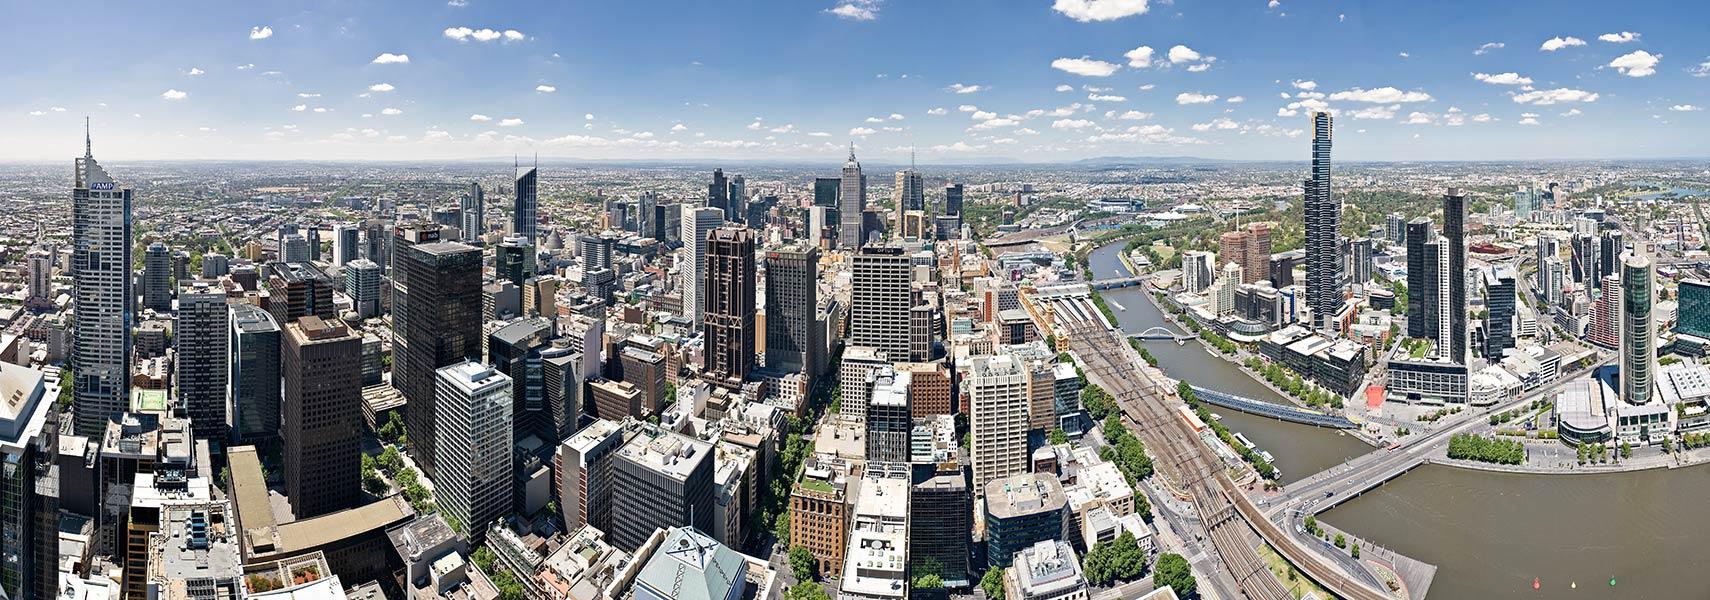 Google Map Of Melbourne Victoria Australia Nations Online Project - Map of victoria australia